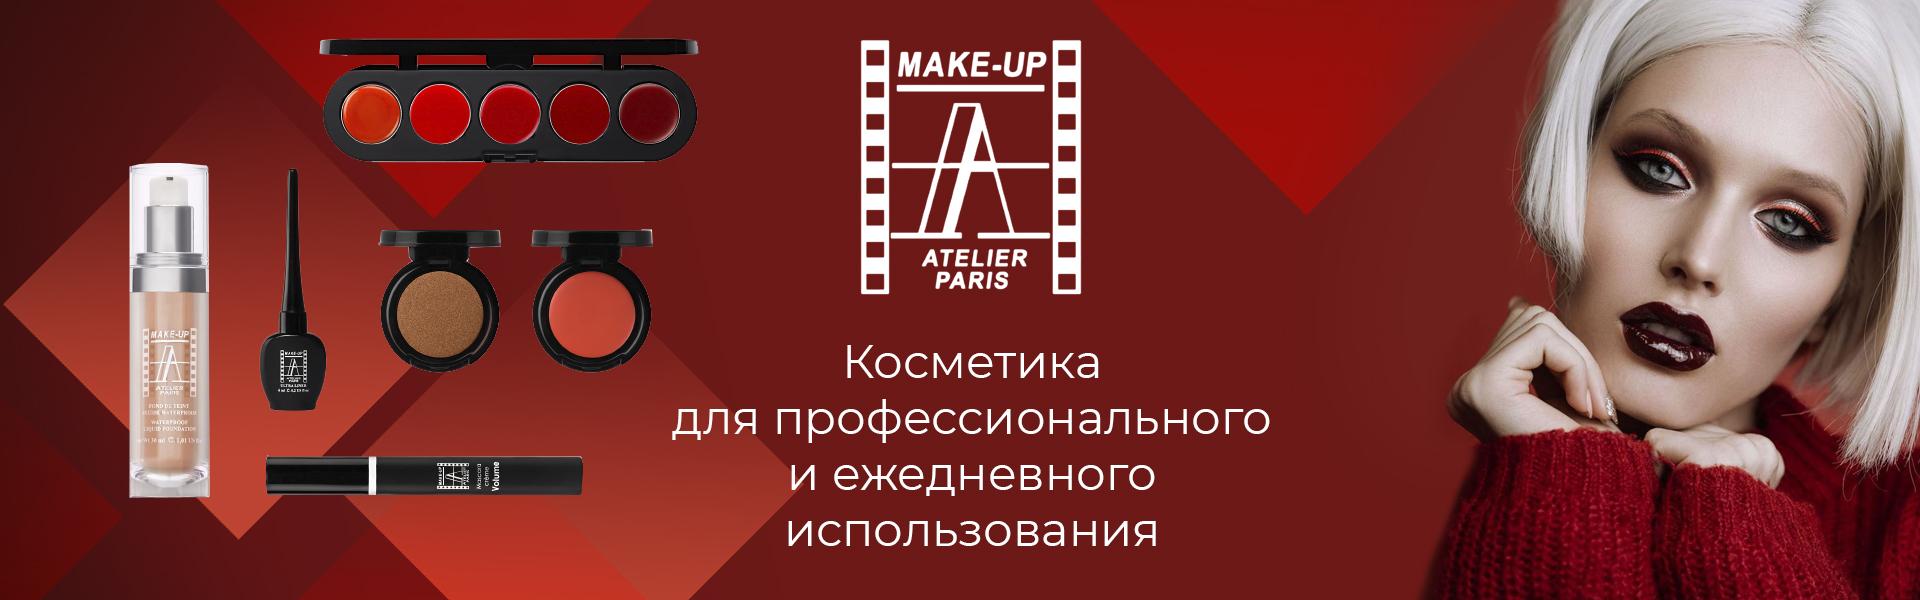 Make up atelier